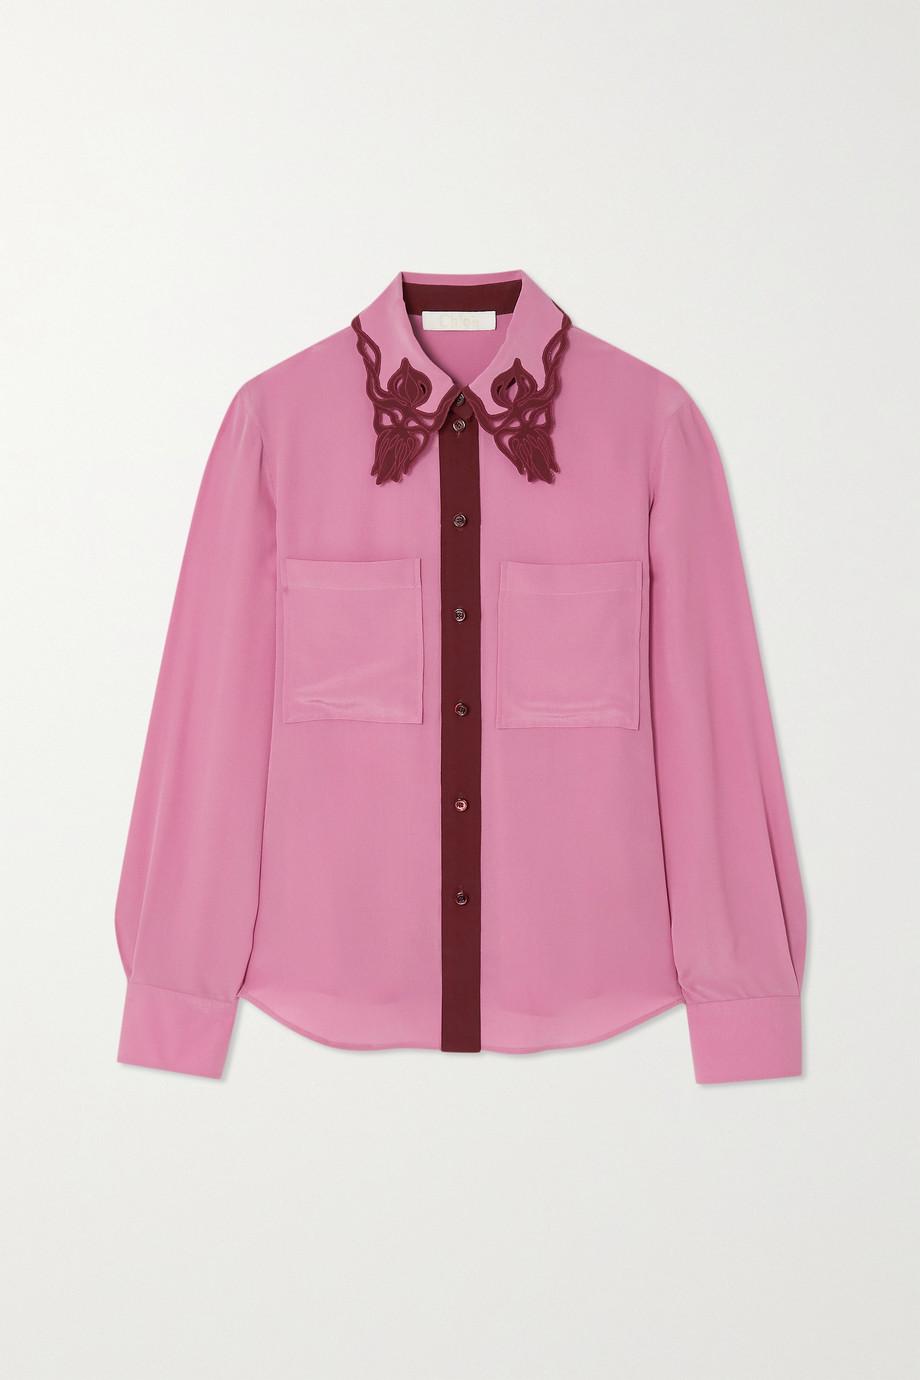 Chloé Embroidered cutout silk crepe de chine shirt